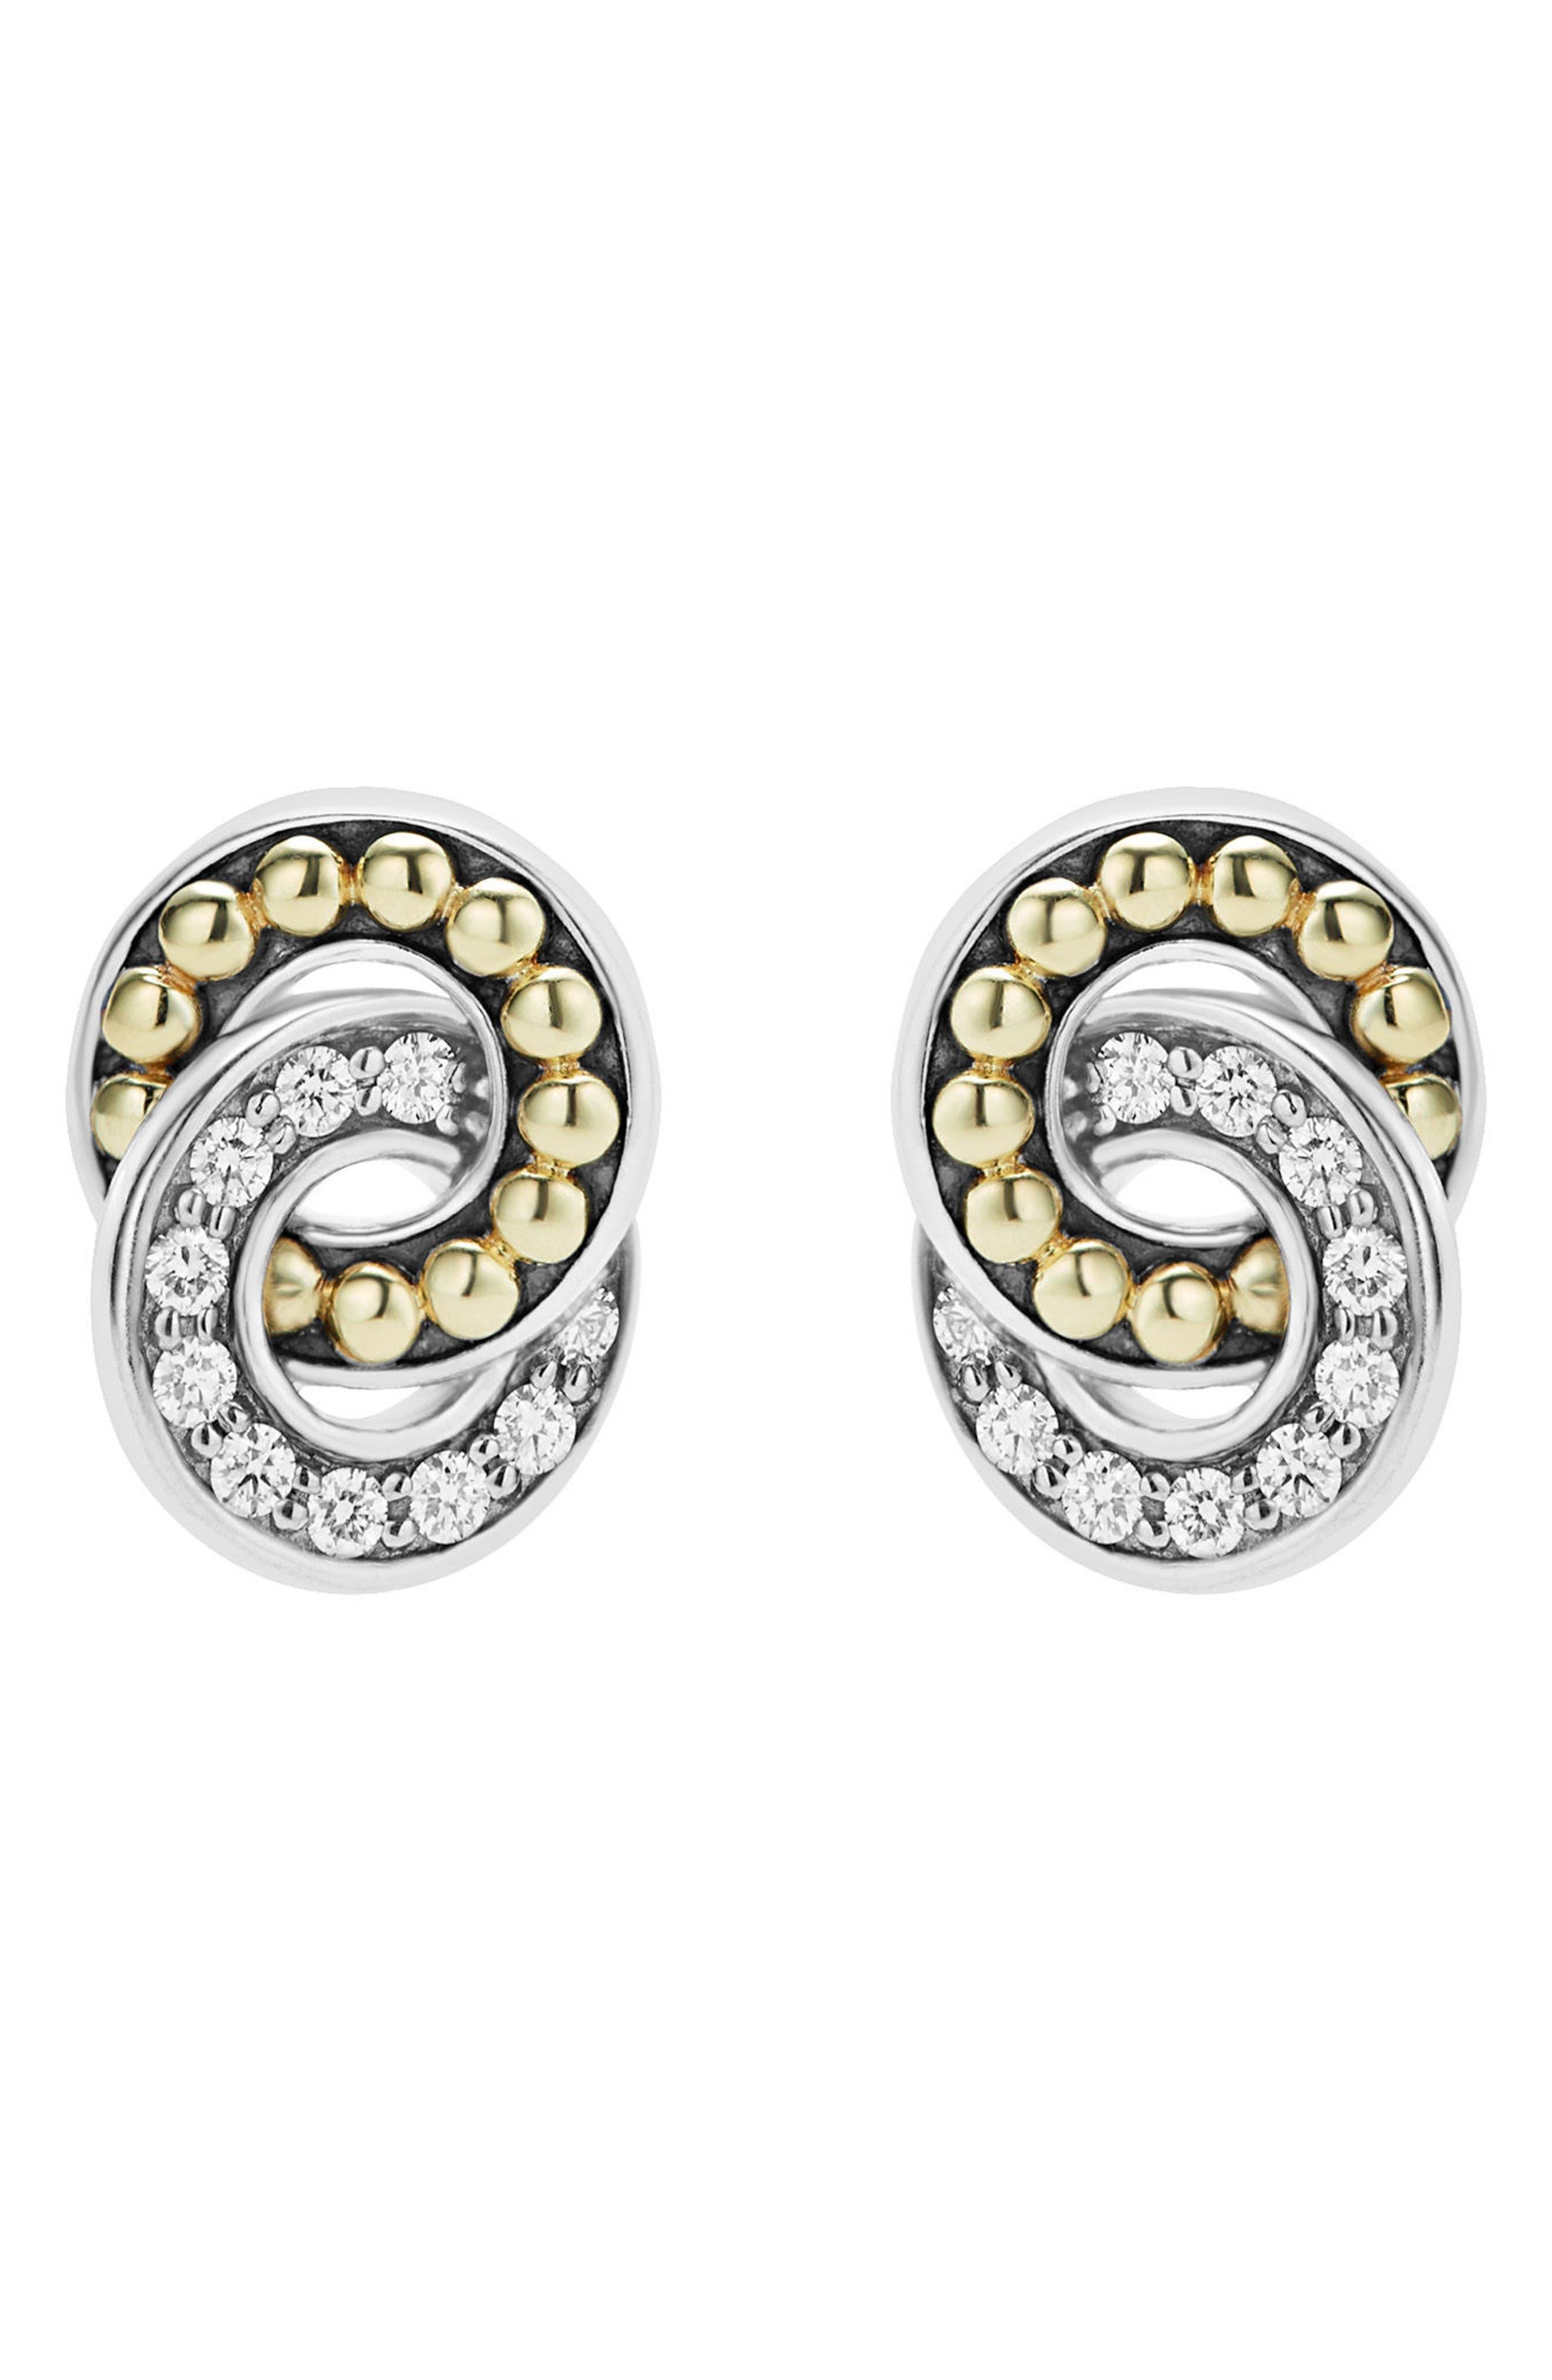 Enso Diamond Stud Earrings,                             Alternate thumbnail 2, color,                             SILVER